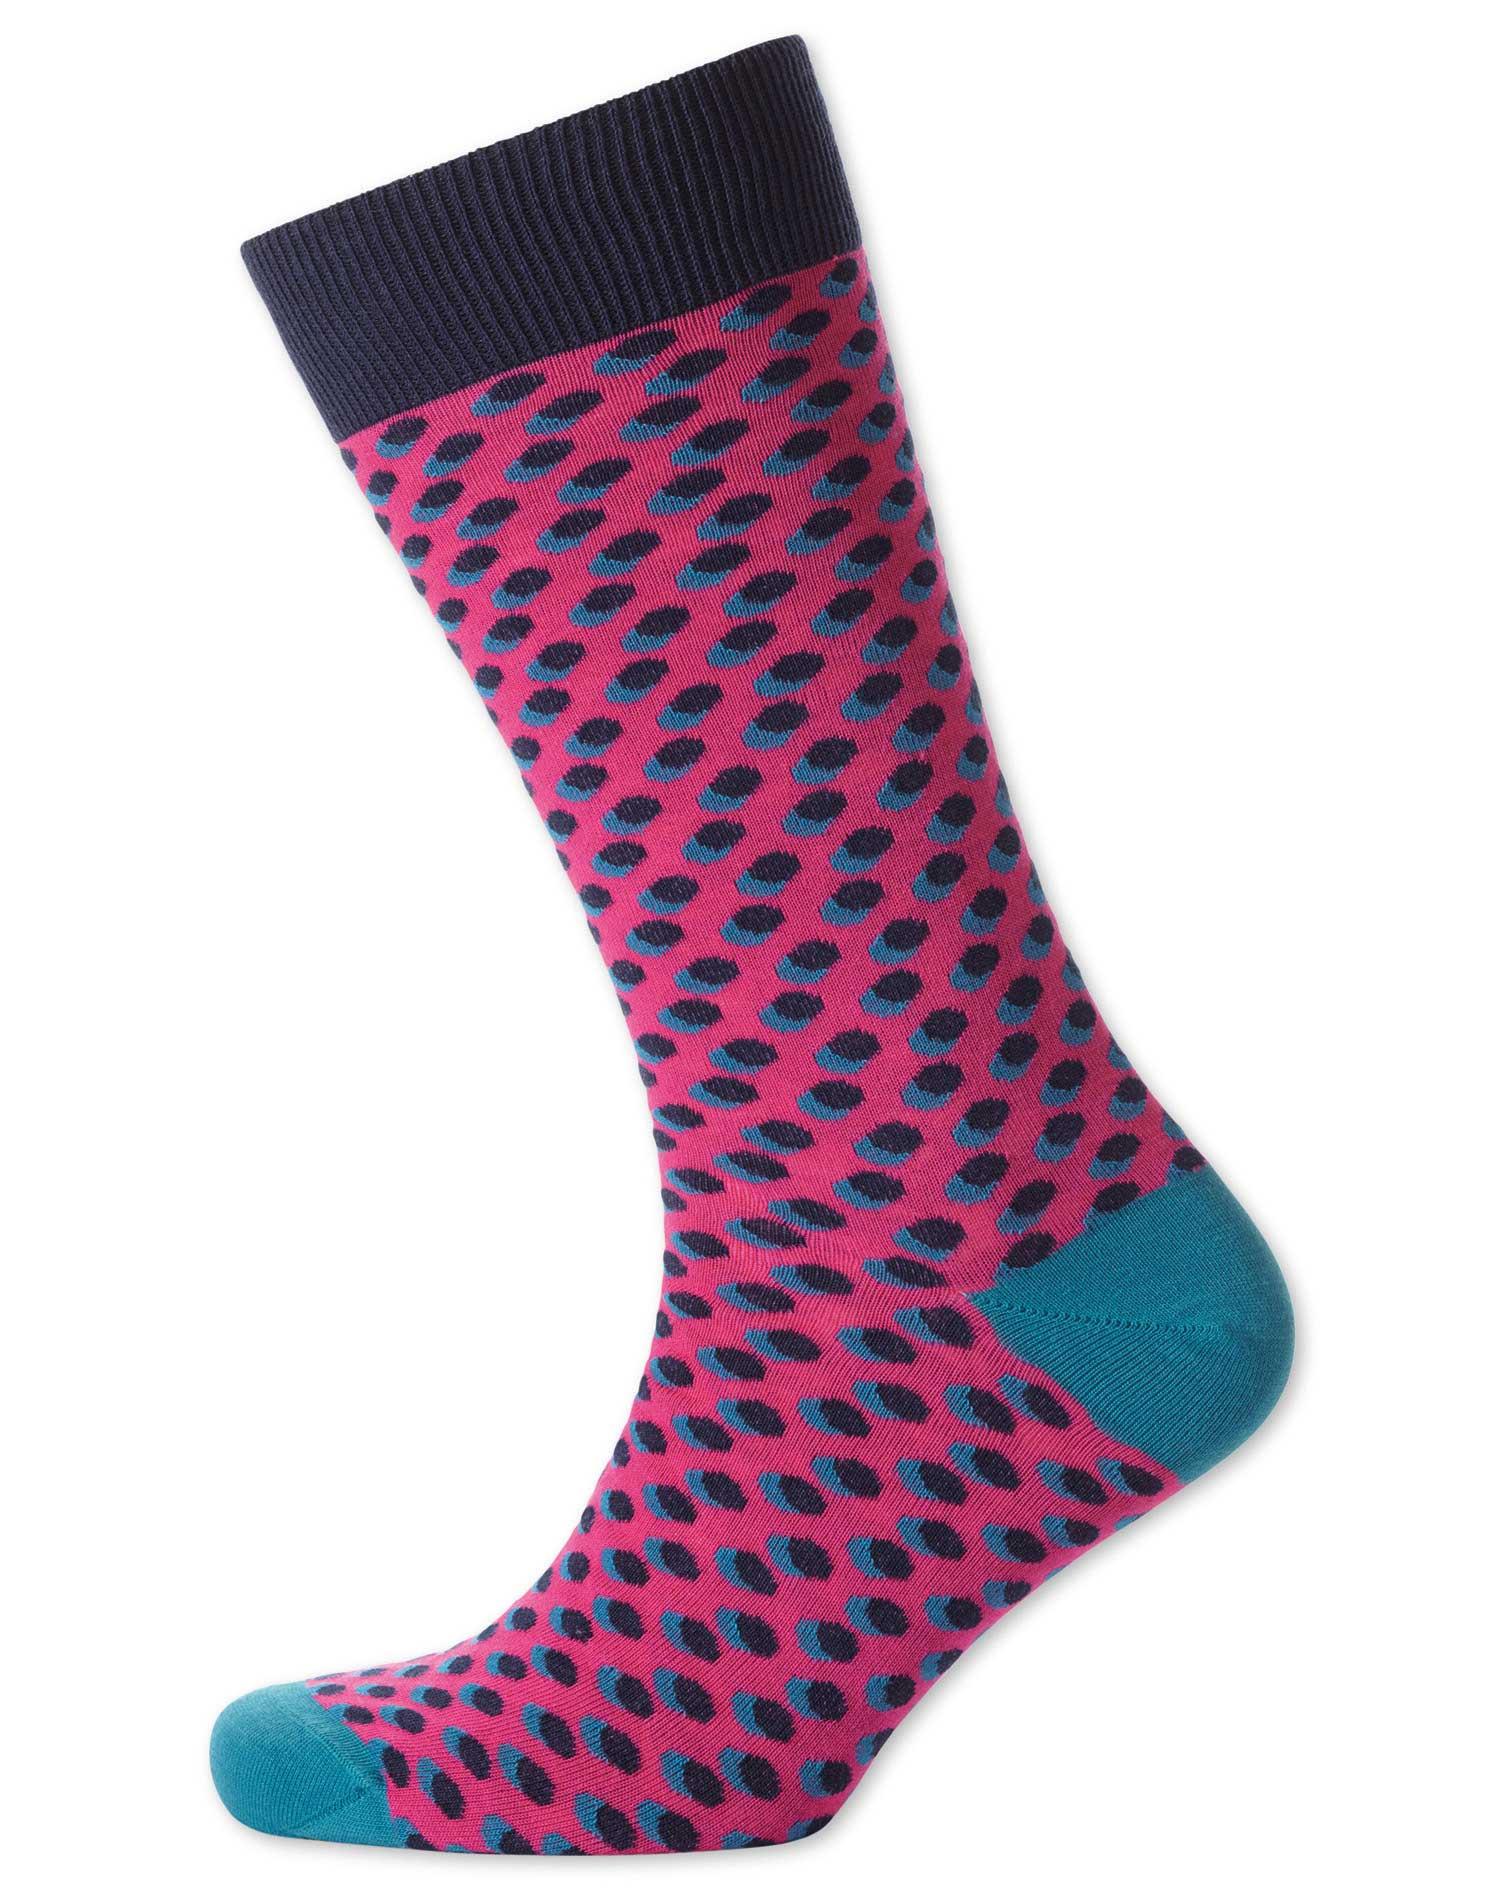 Pink Shadow Spot Socks Size Large by Charles Tyrwhitt